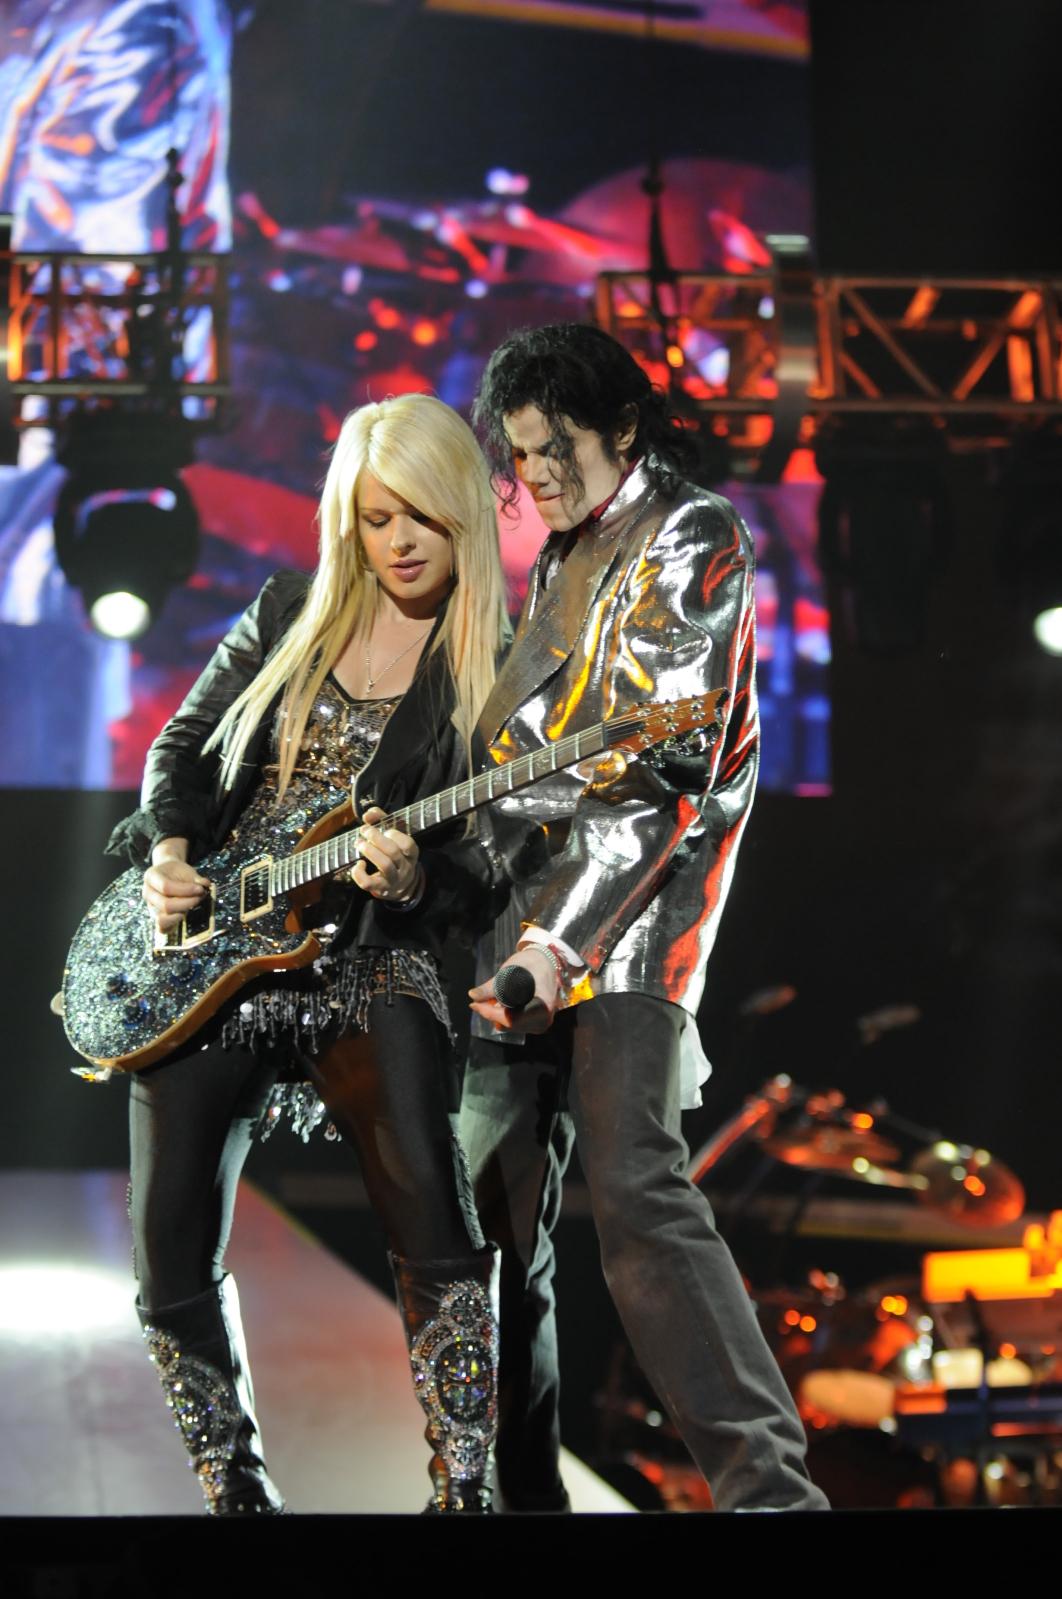 http://2.bp.blogspot.com/__iuYbs5zGVw/TRbWCxgAWpI/AAAAAAAAASo/w0f7BHRTj18/s1600/michael-jackson-this-is-it-guitar-1.jpg